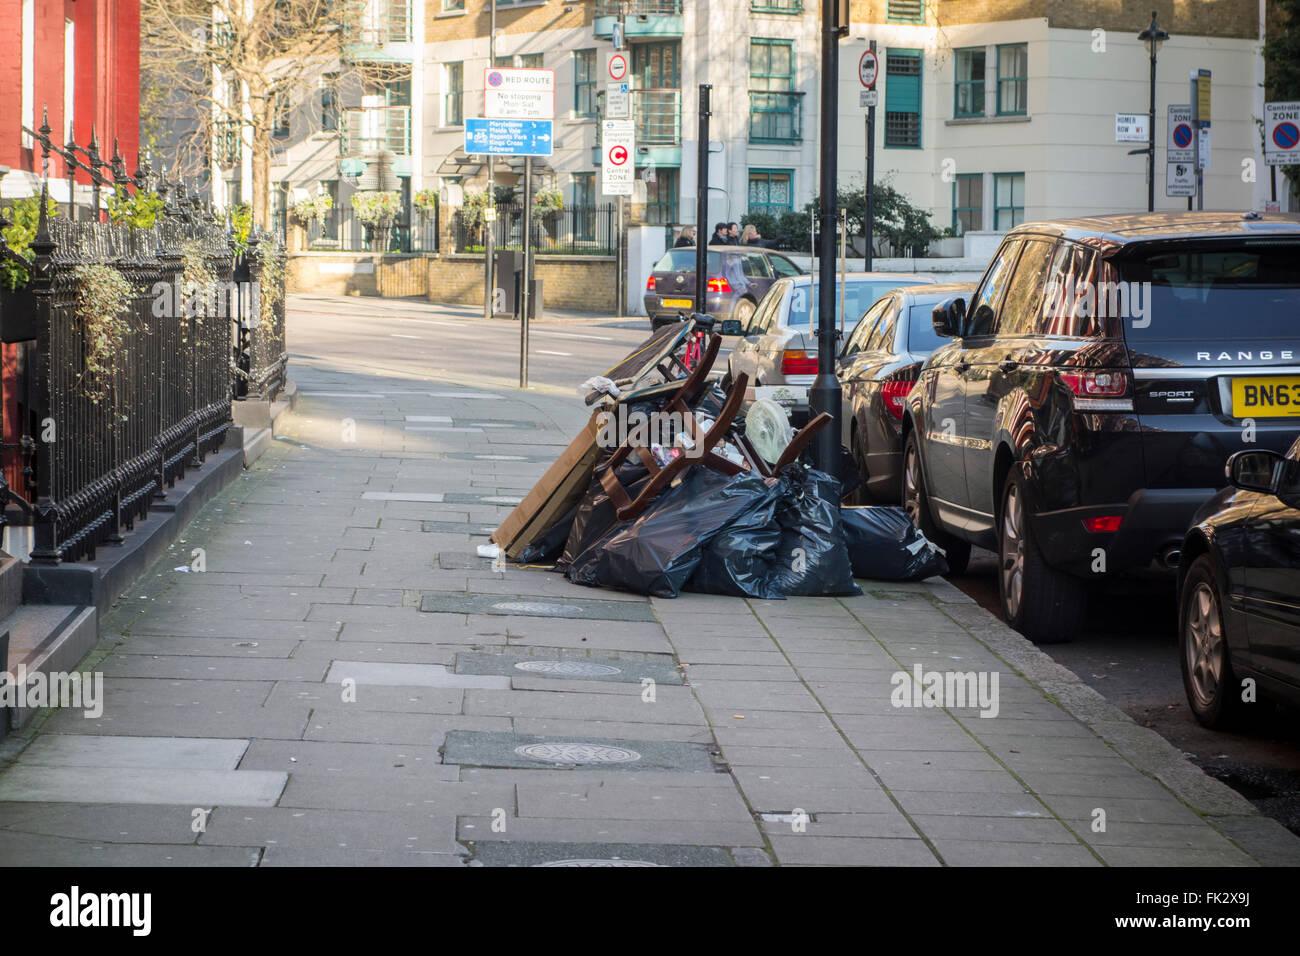 Las bolsas de basura en Old Marylebone Road, London, UK Foto de stock